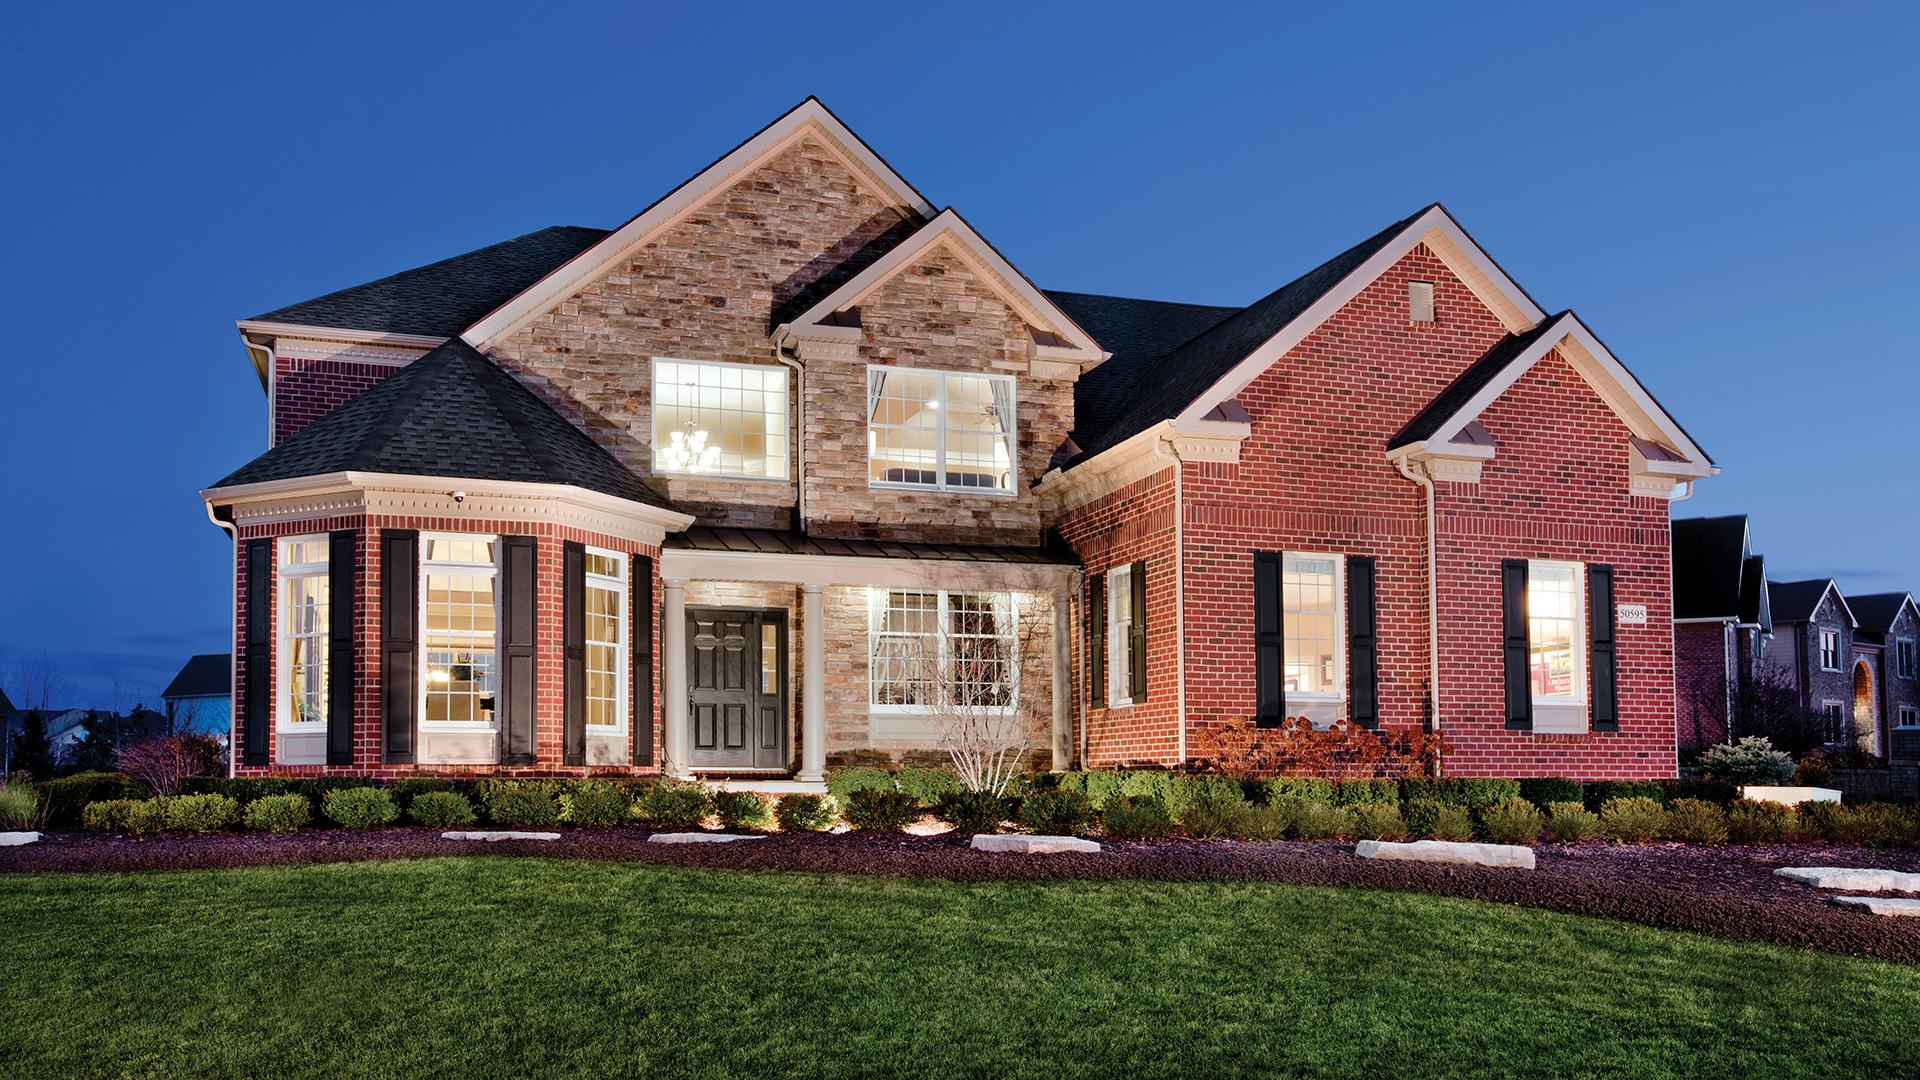 Novi MI New Homes for Sale